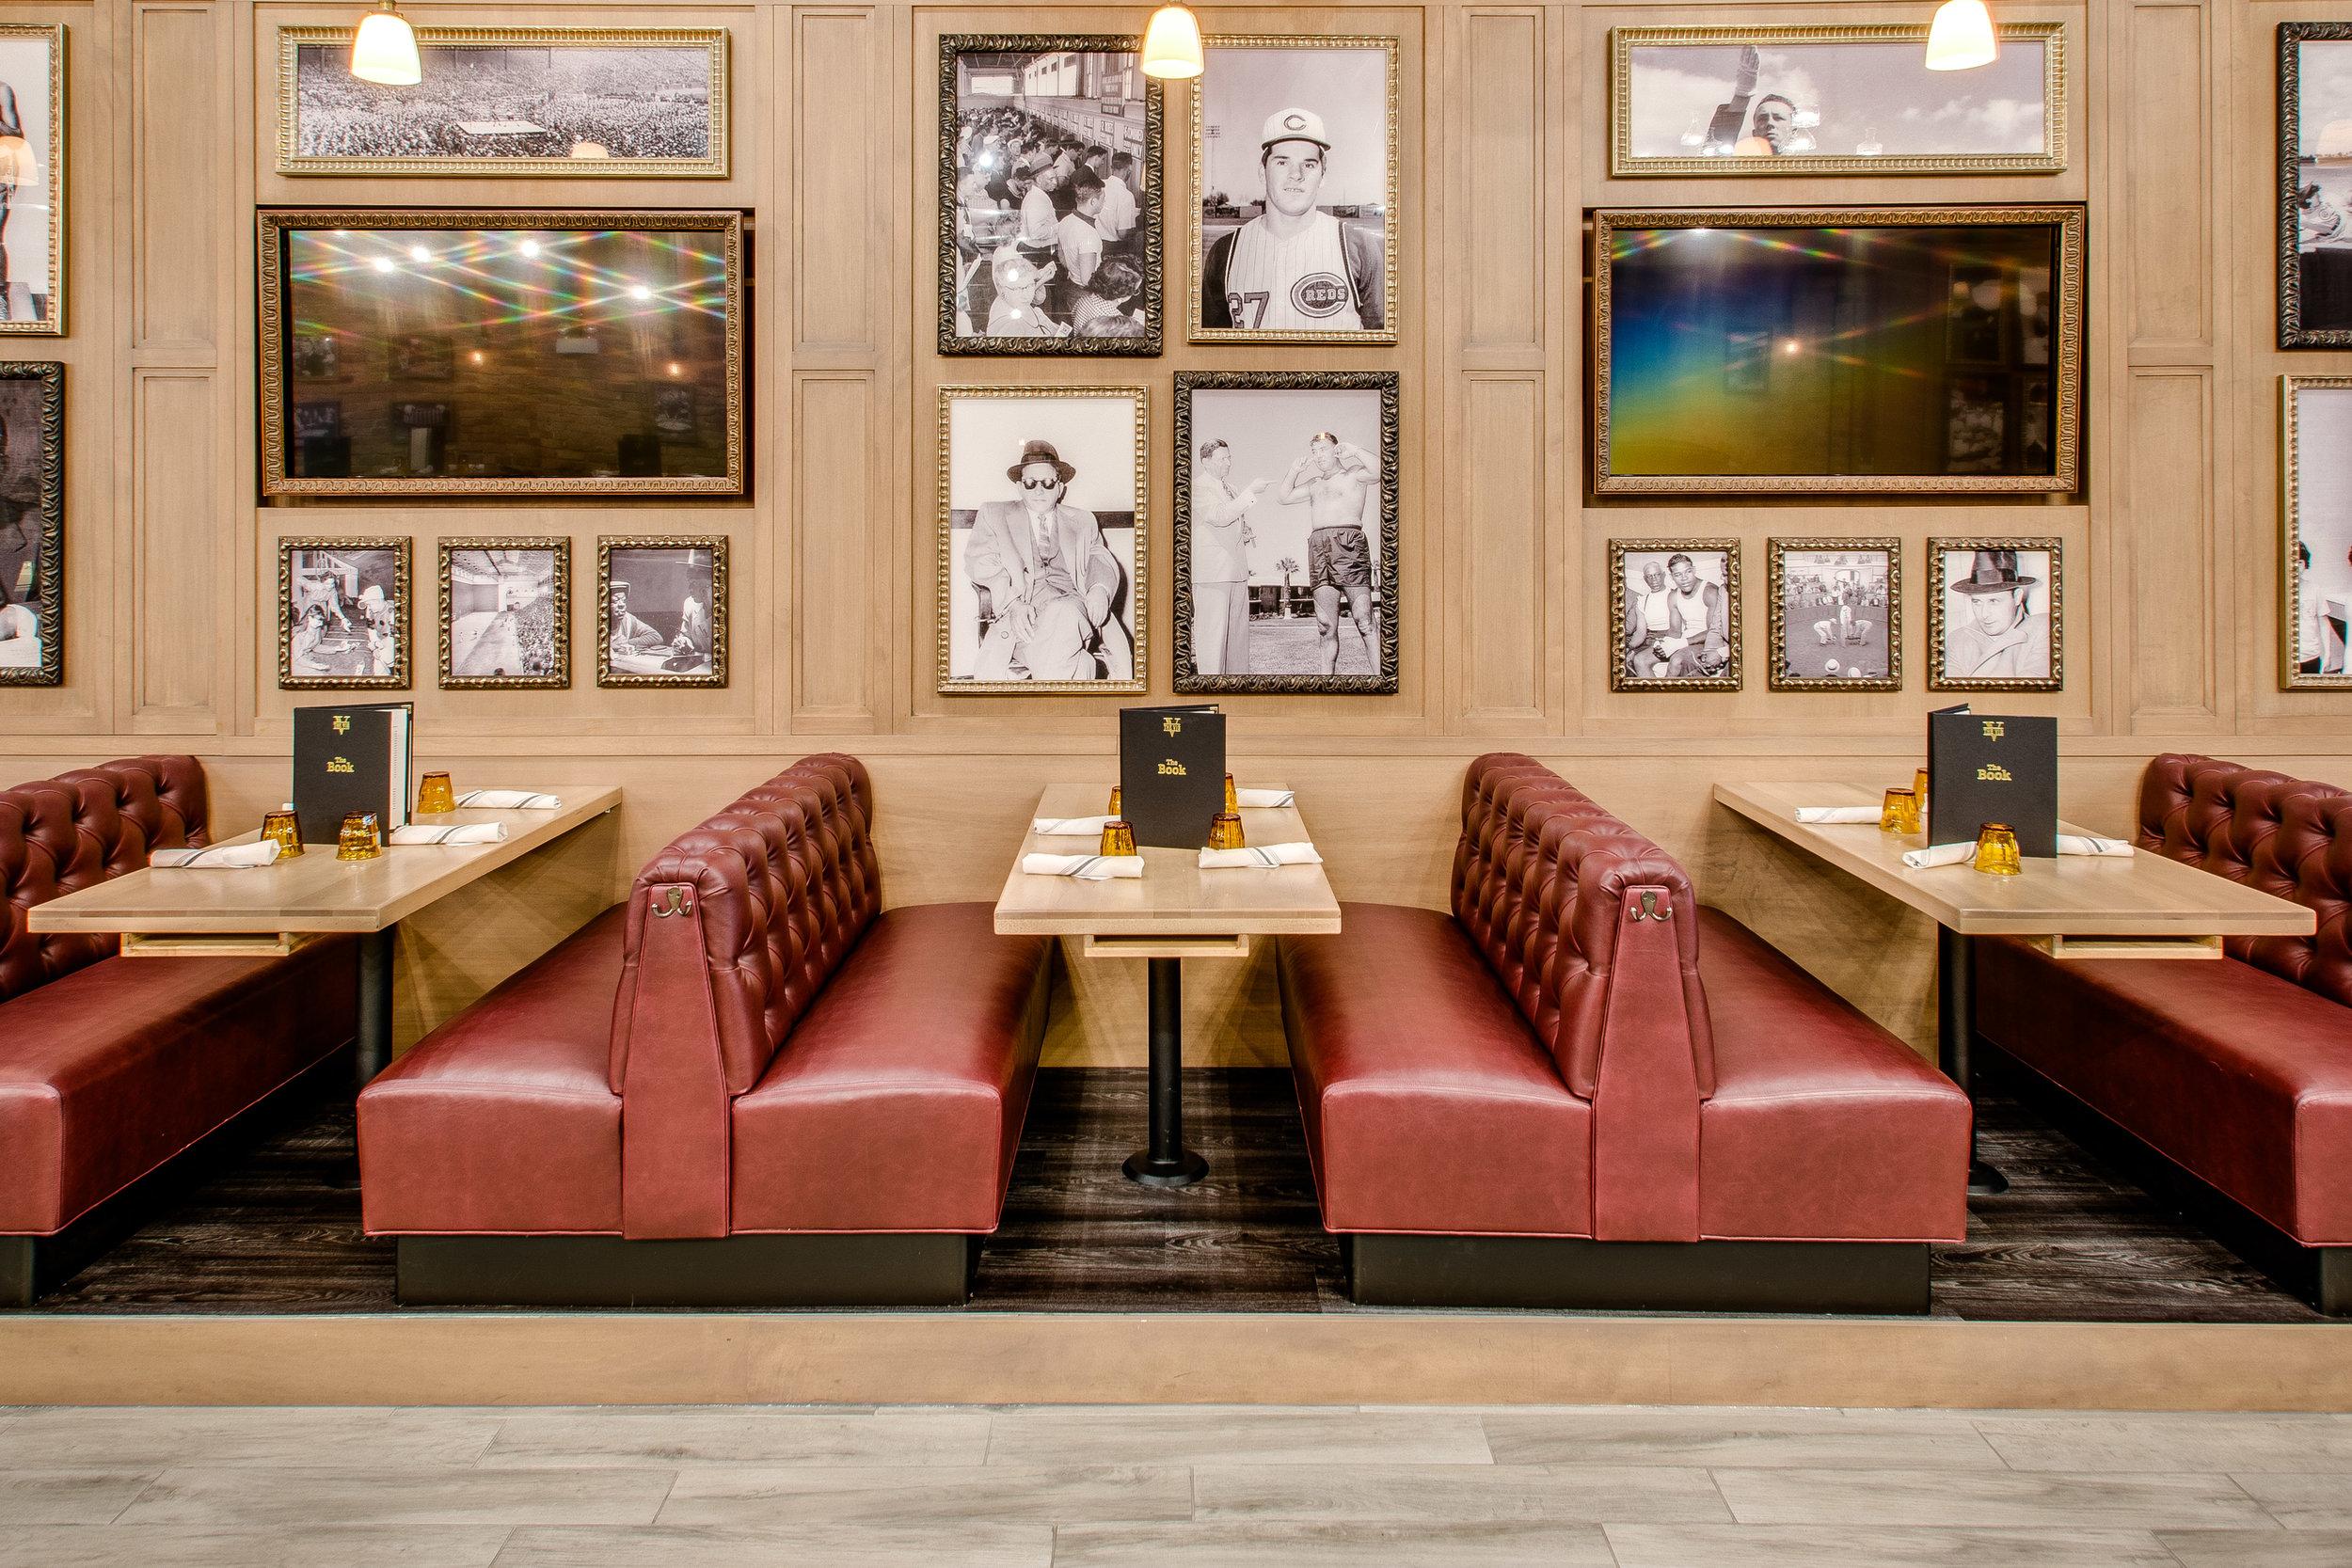 theVig_restaurant_027 - Copy.jpg